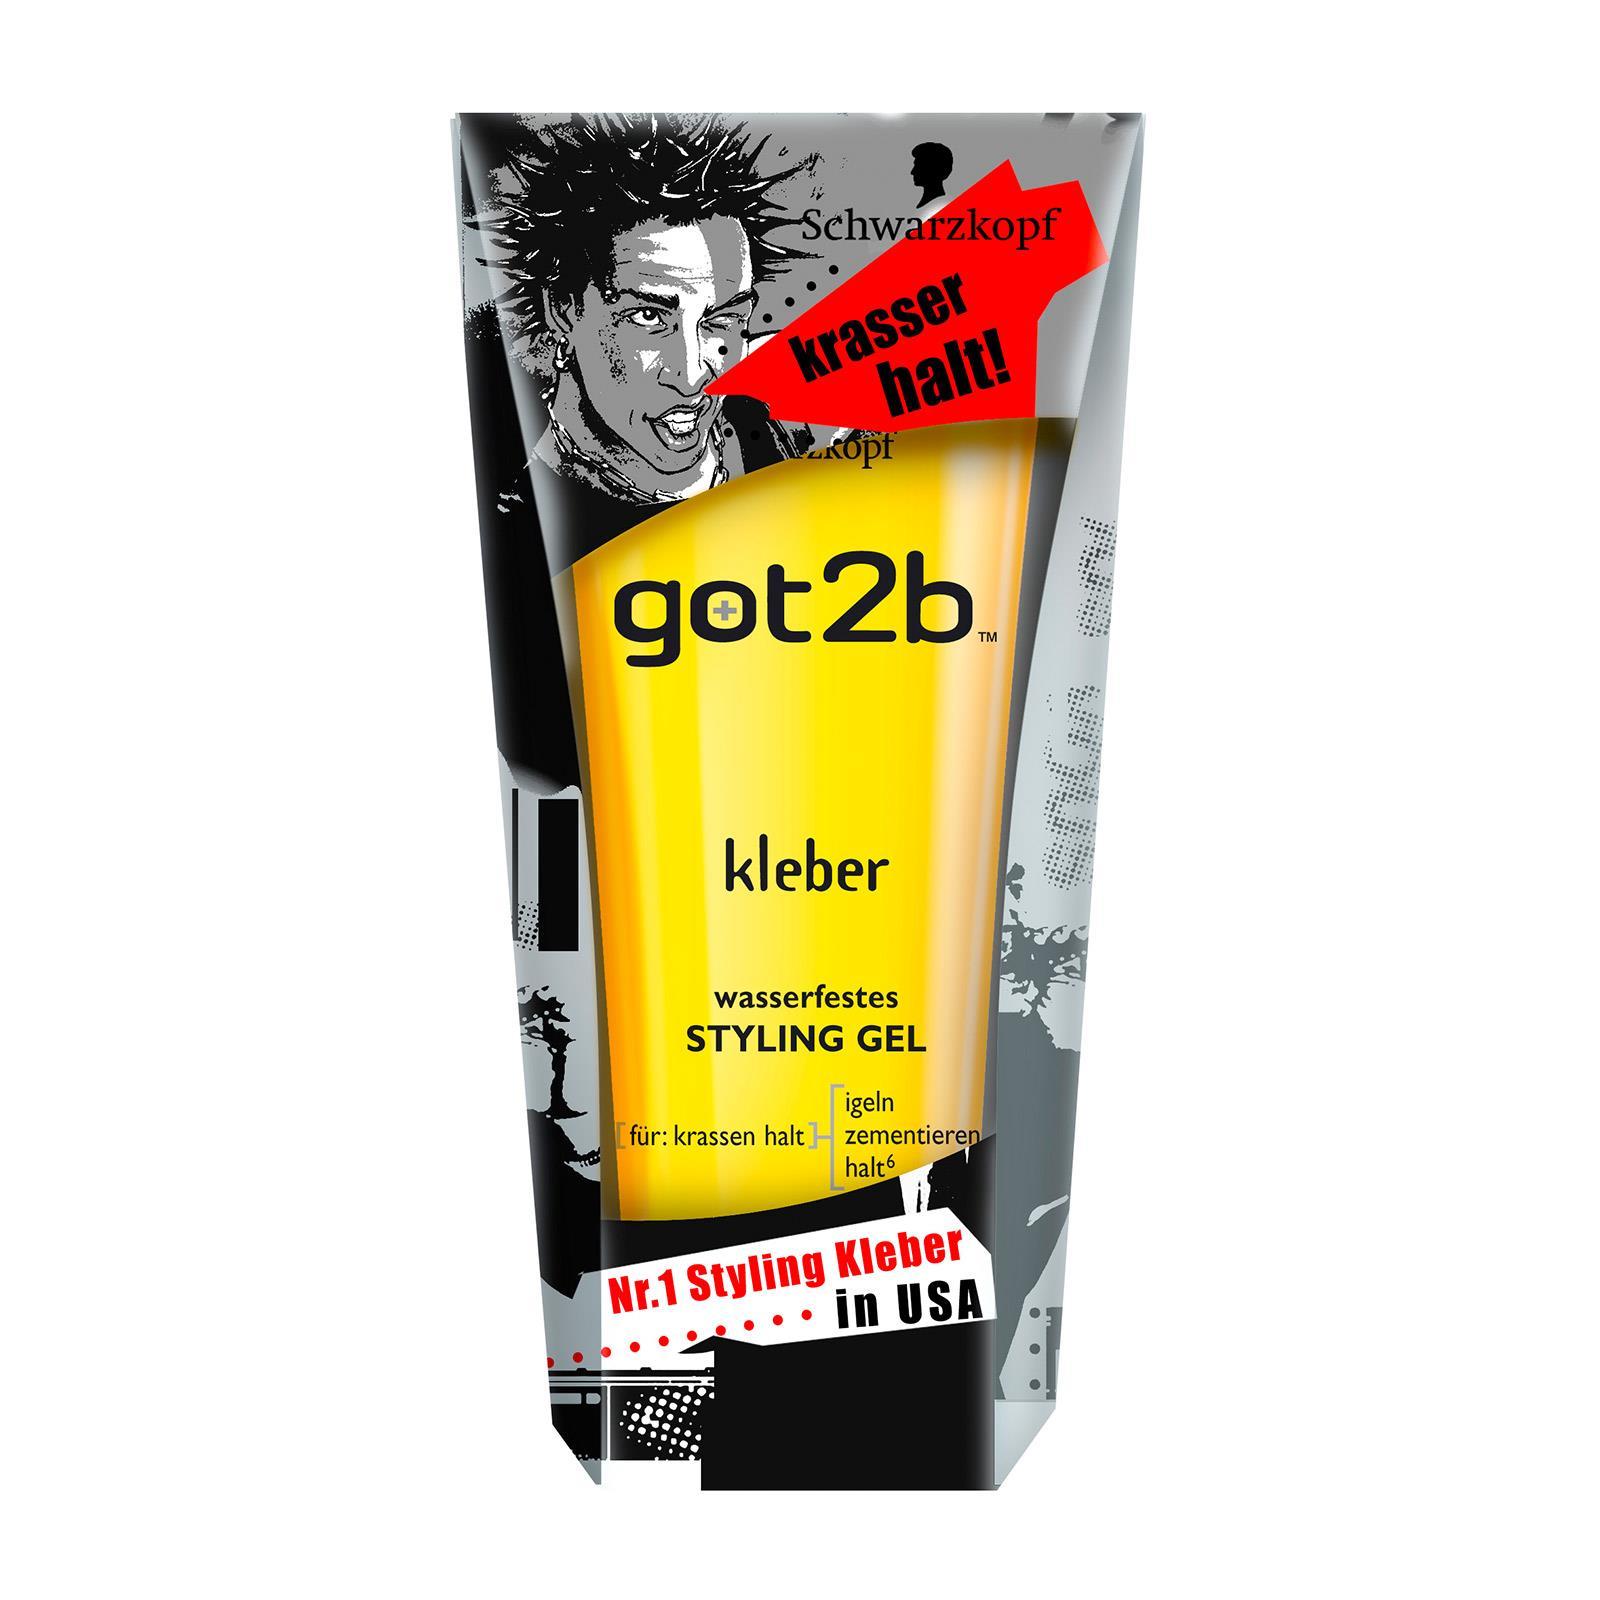 AMAZON.de l Schwarzkopf got2b Gel kleber wasserfestes Styling, 4er Pack Spar-Abo € 12,85